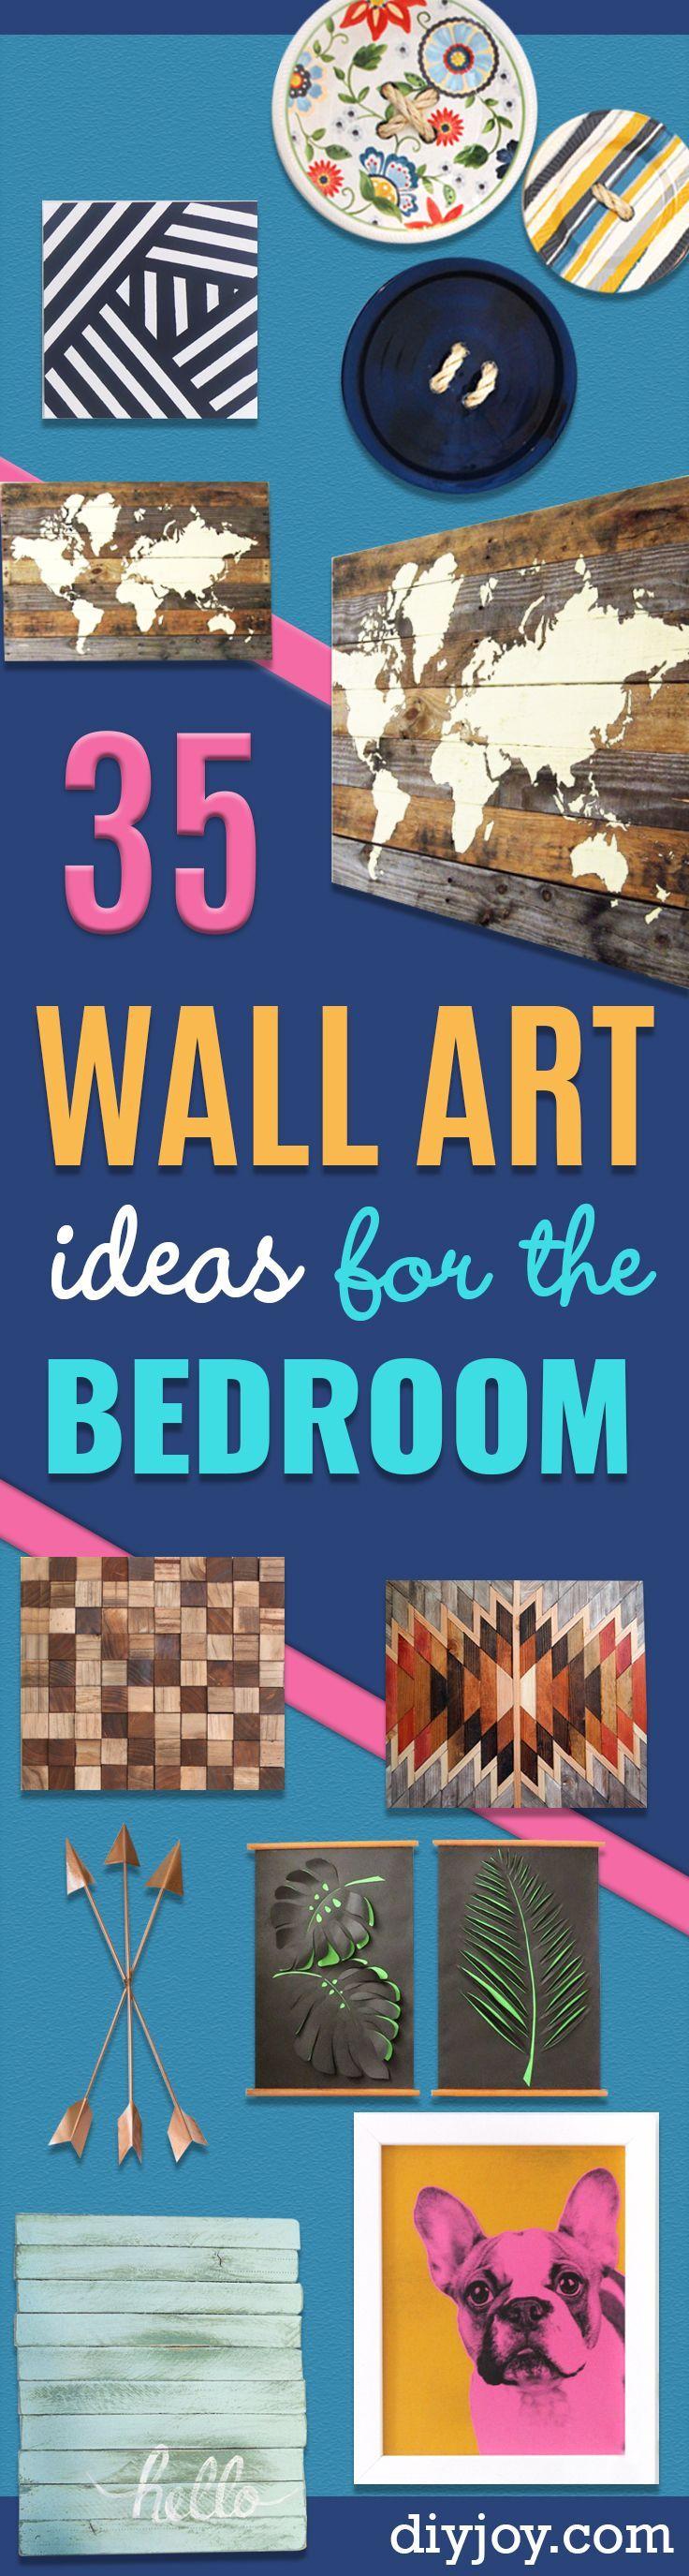 wall art ideas for the bedroom home decor pinterest bedroom